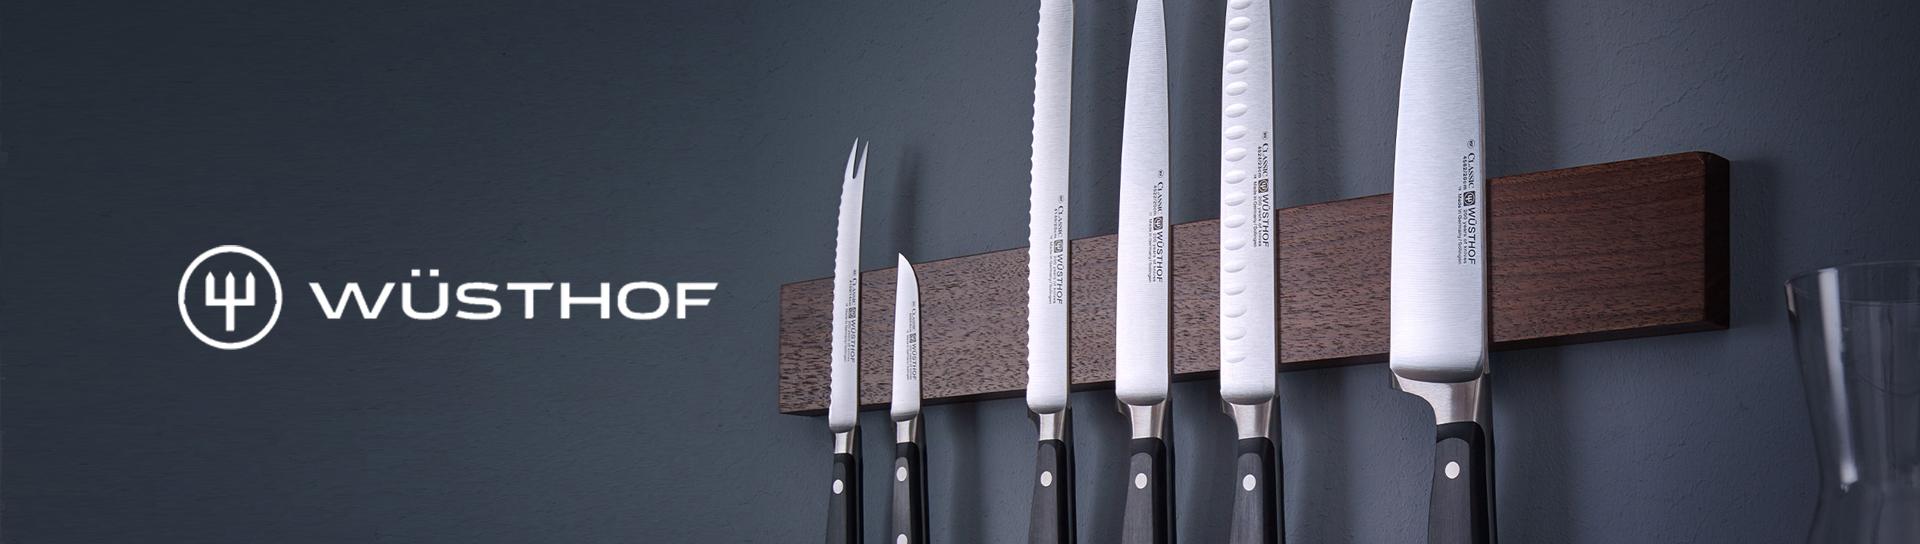 Cuchillos Wusthof